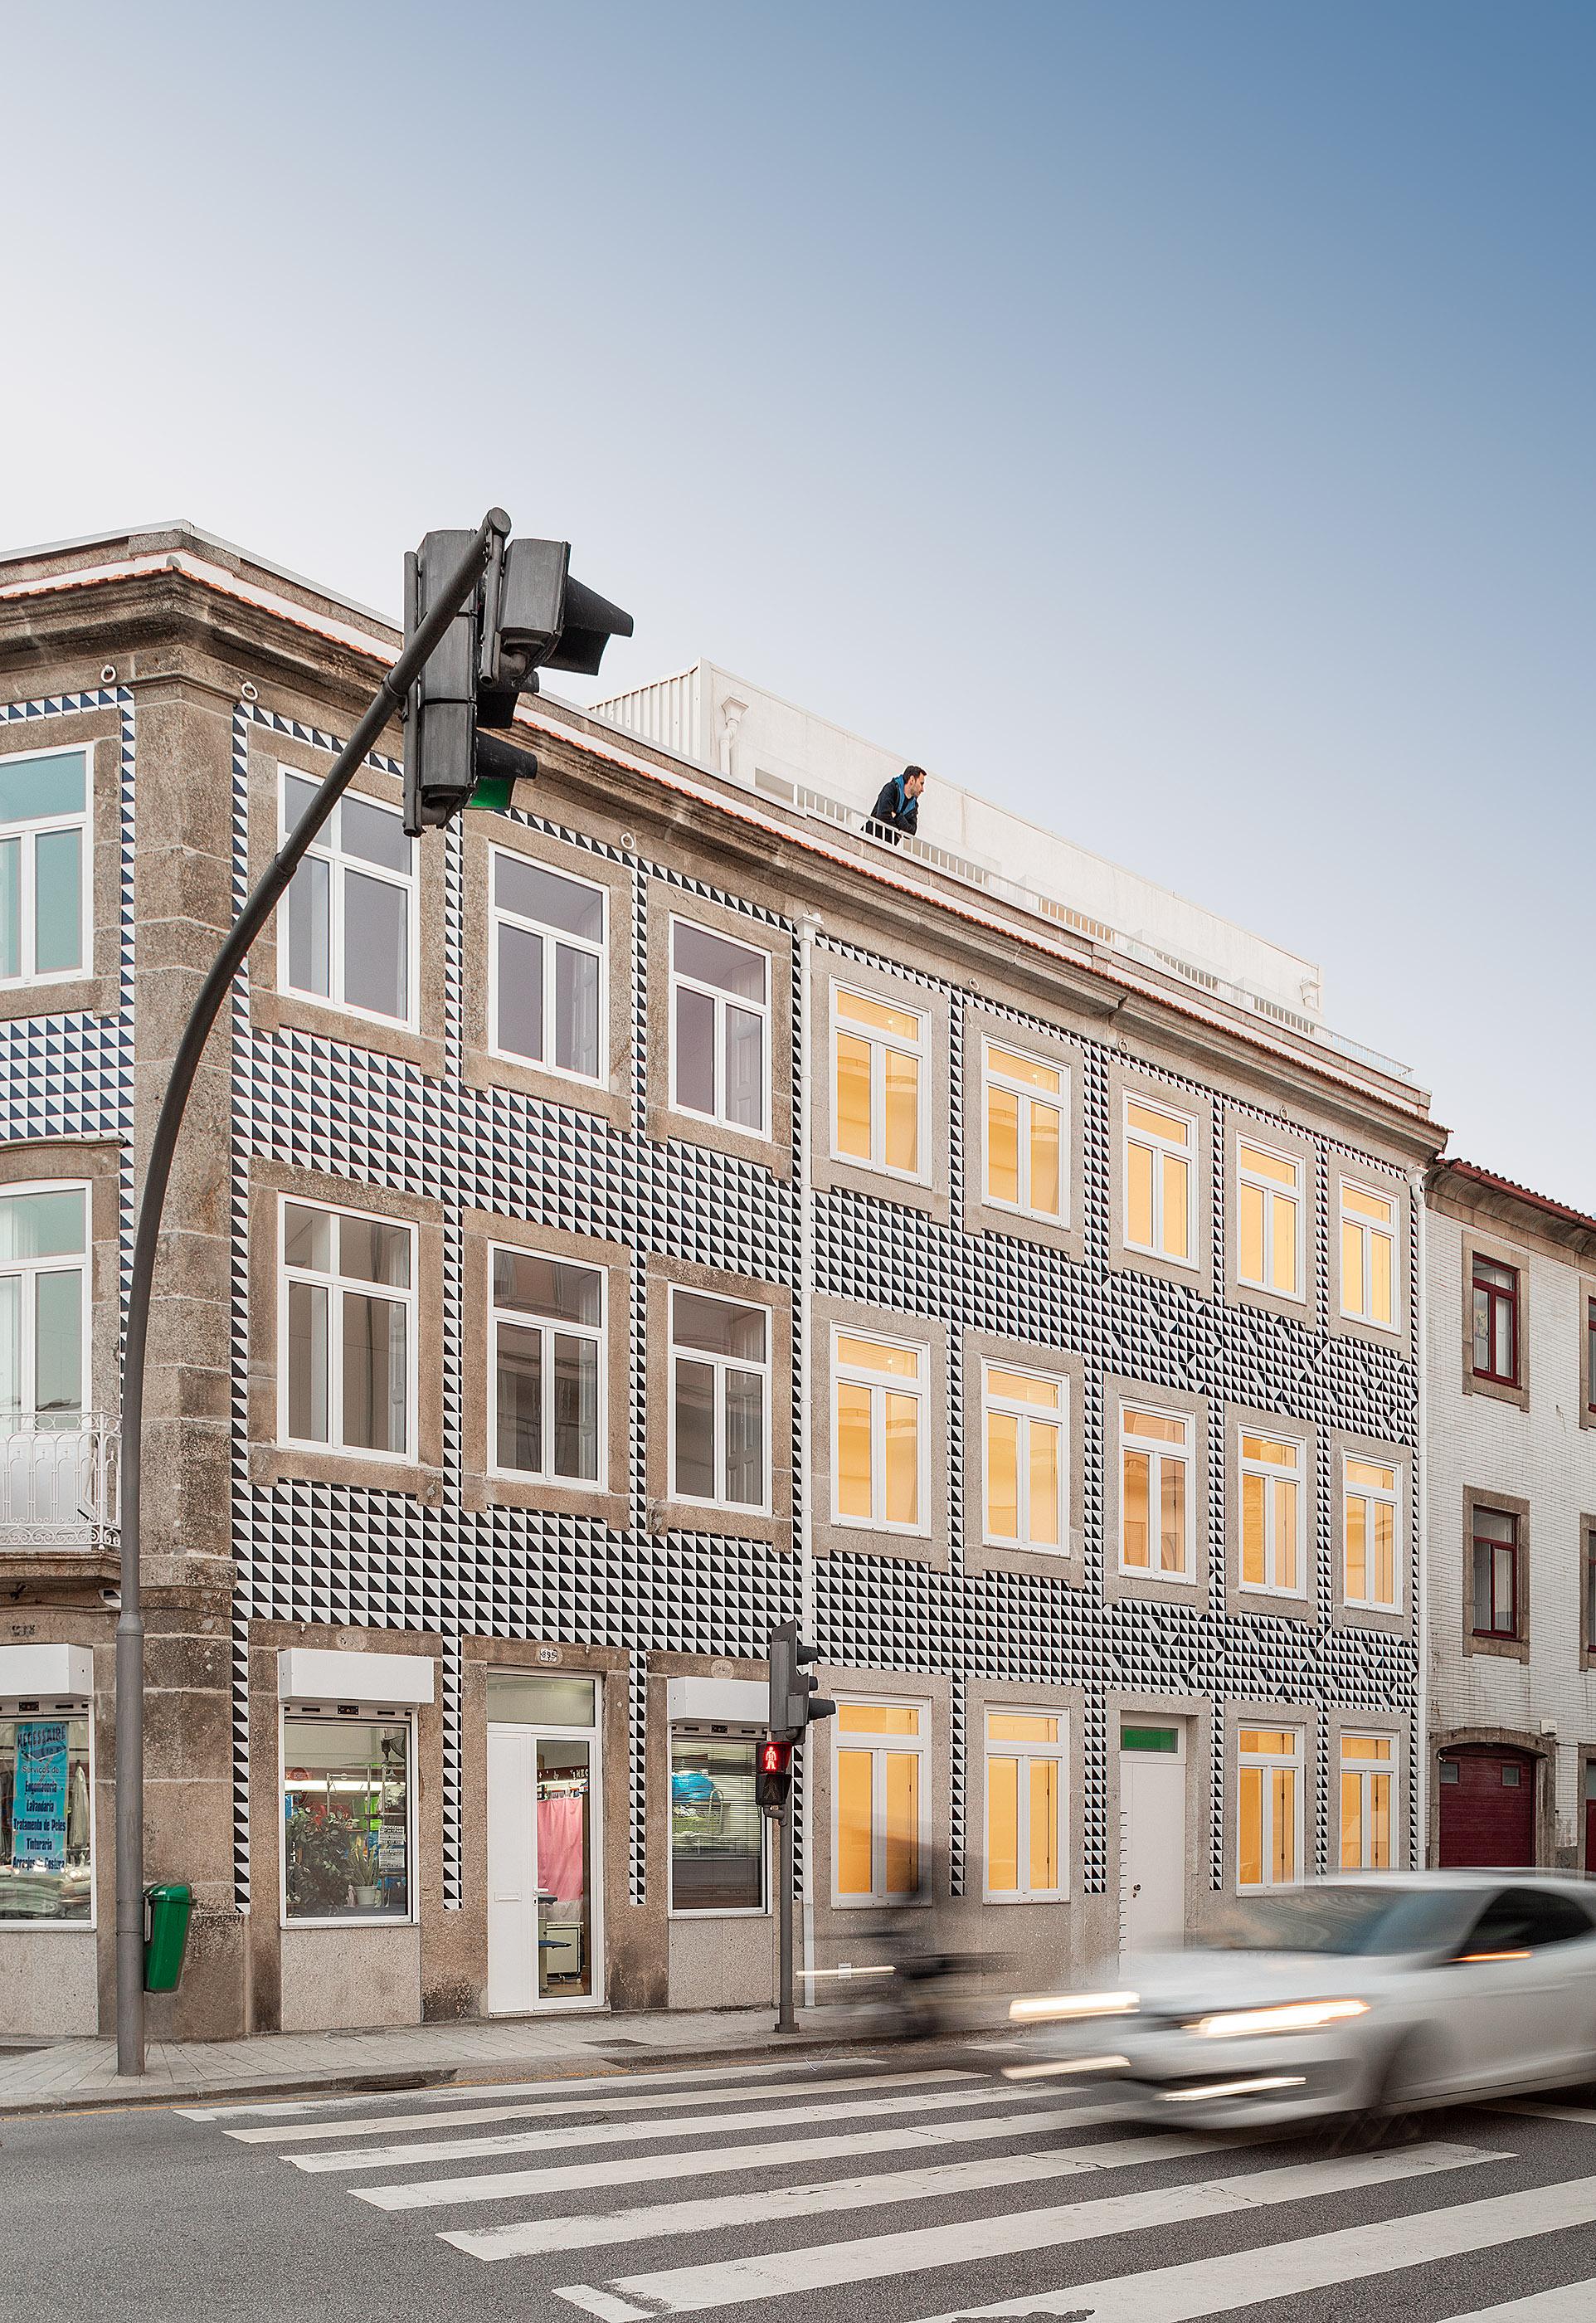 20190315 Mimool Rua Da Alegria 86 do fotografo Ivo Tavares Studio